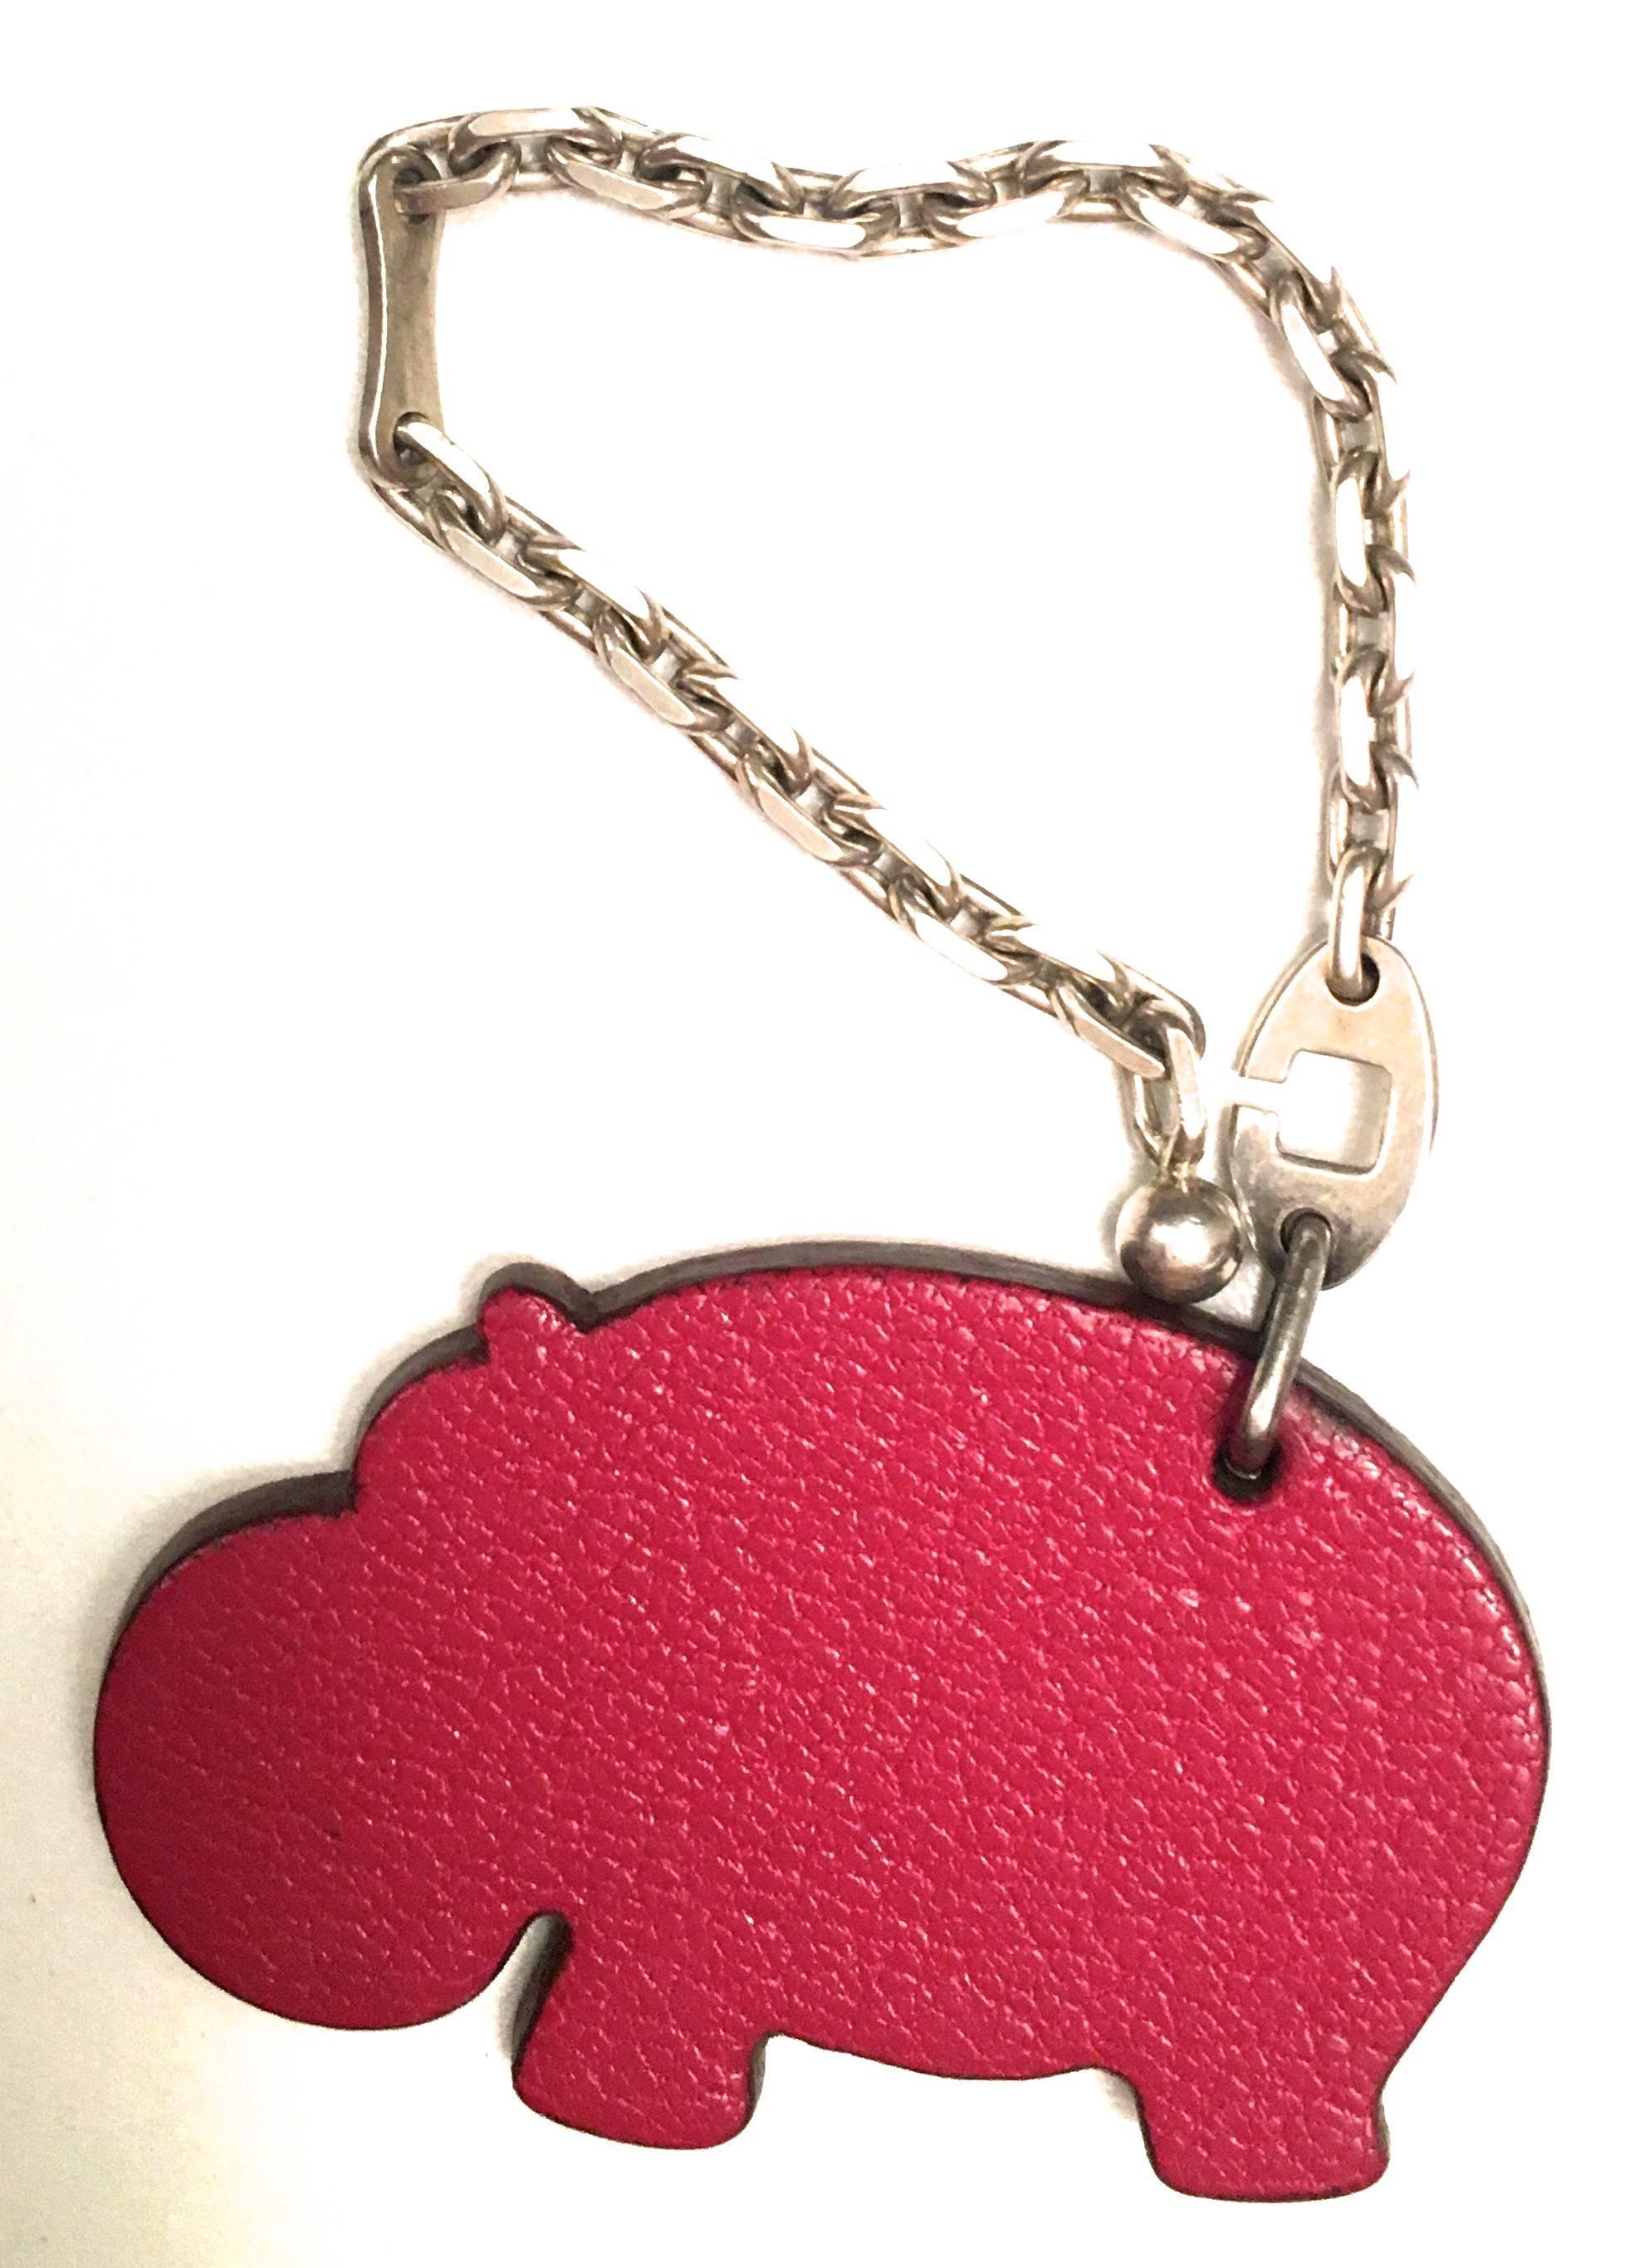 Hermès Hermes Charm / Keychain - Hippopotamus - Sterling Silver / Leather 5Q06nM